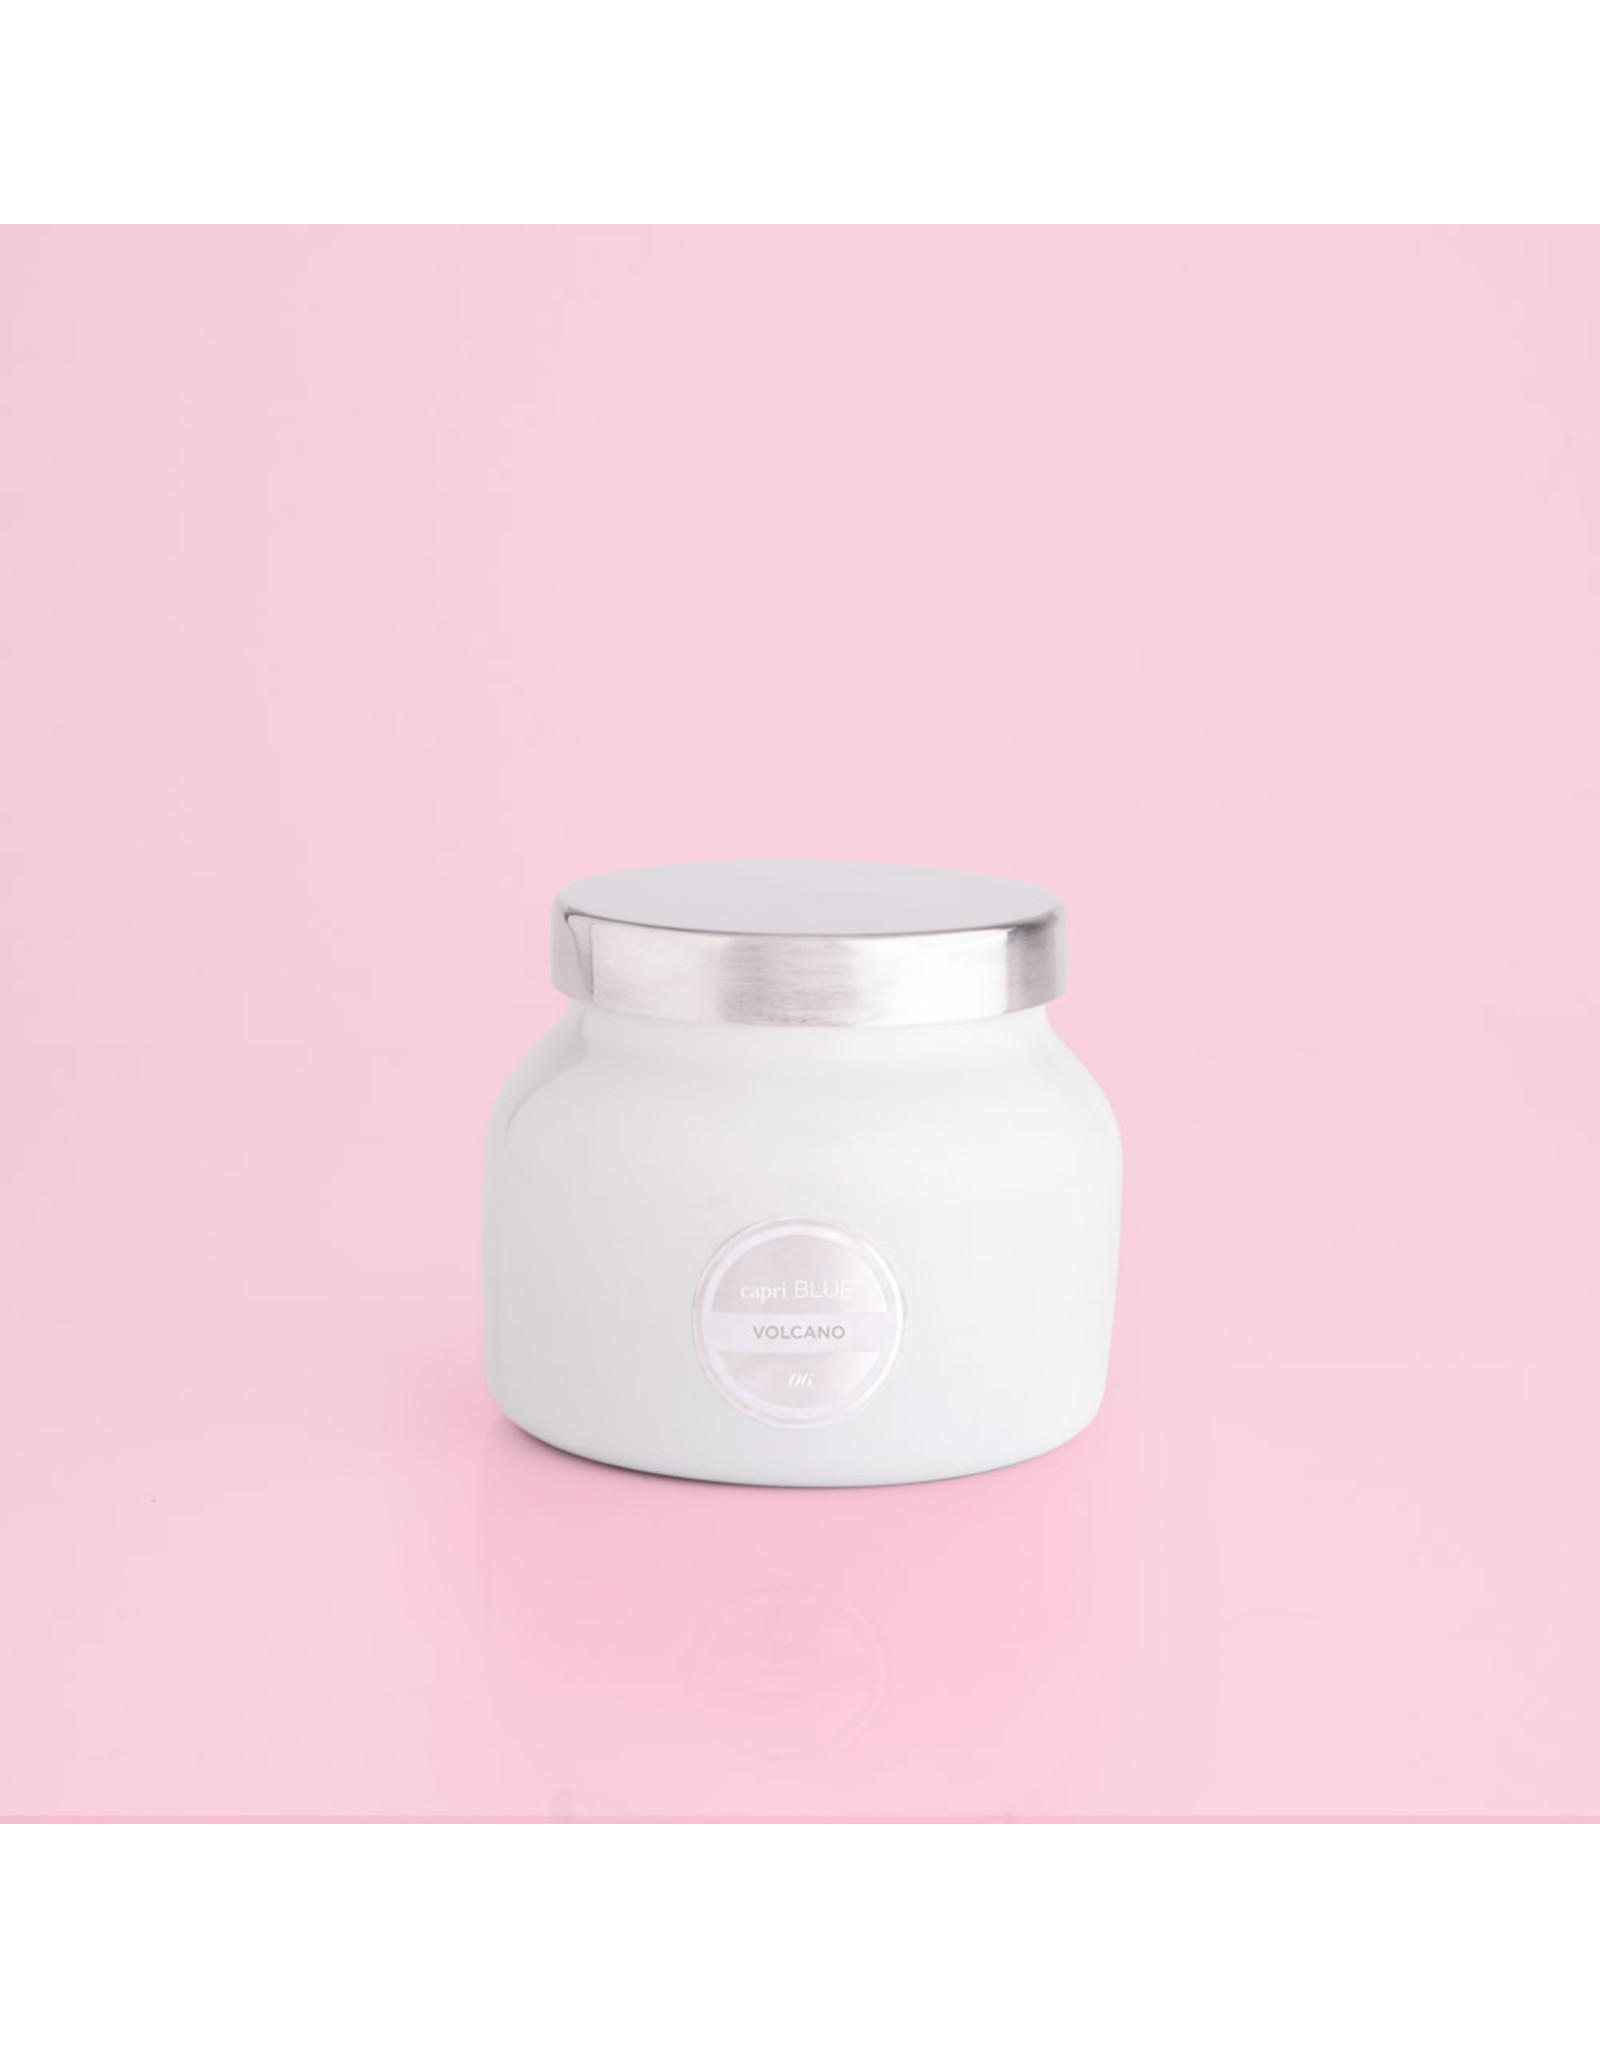 Capri Blue Volcano White Petite Jar Candle